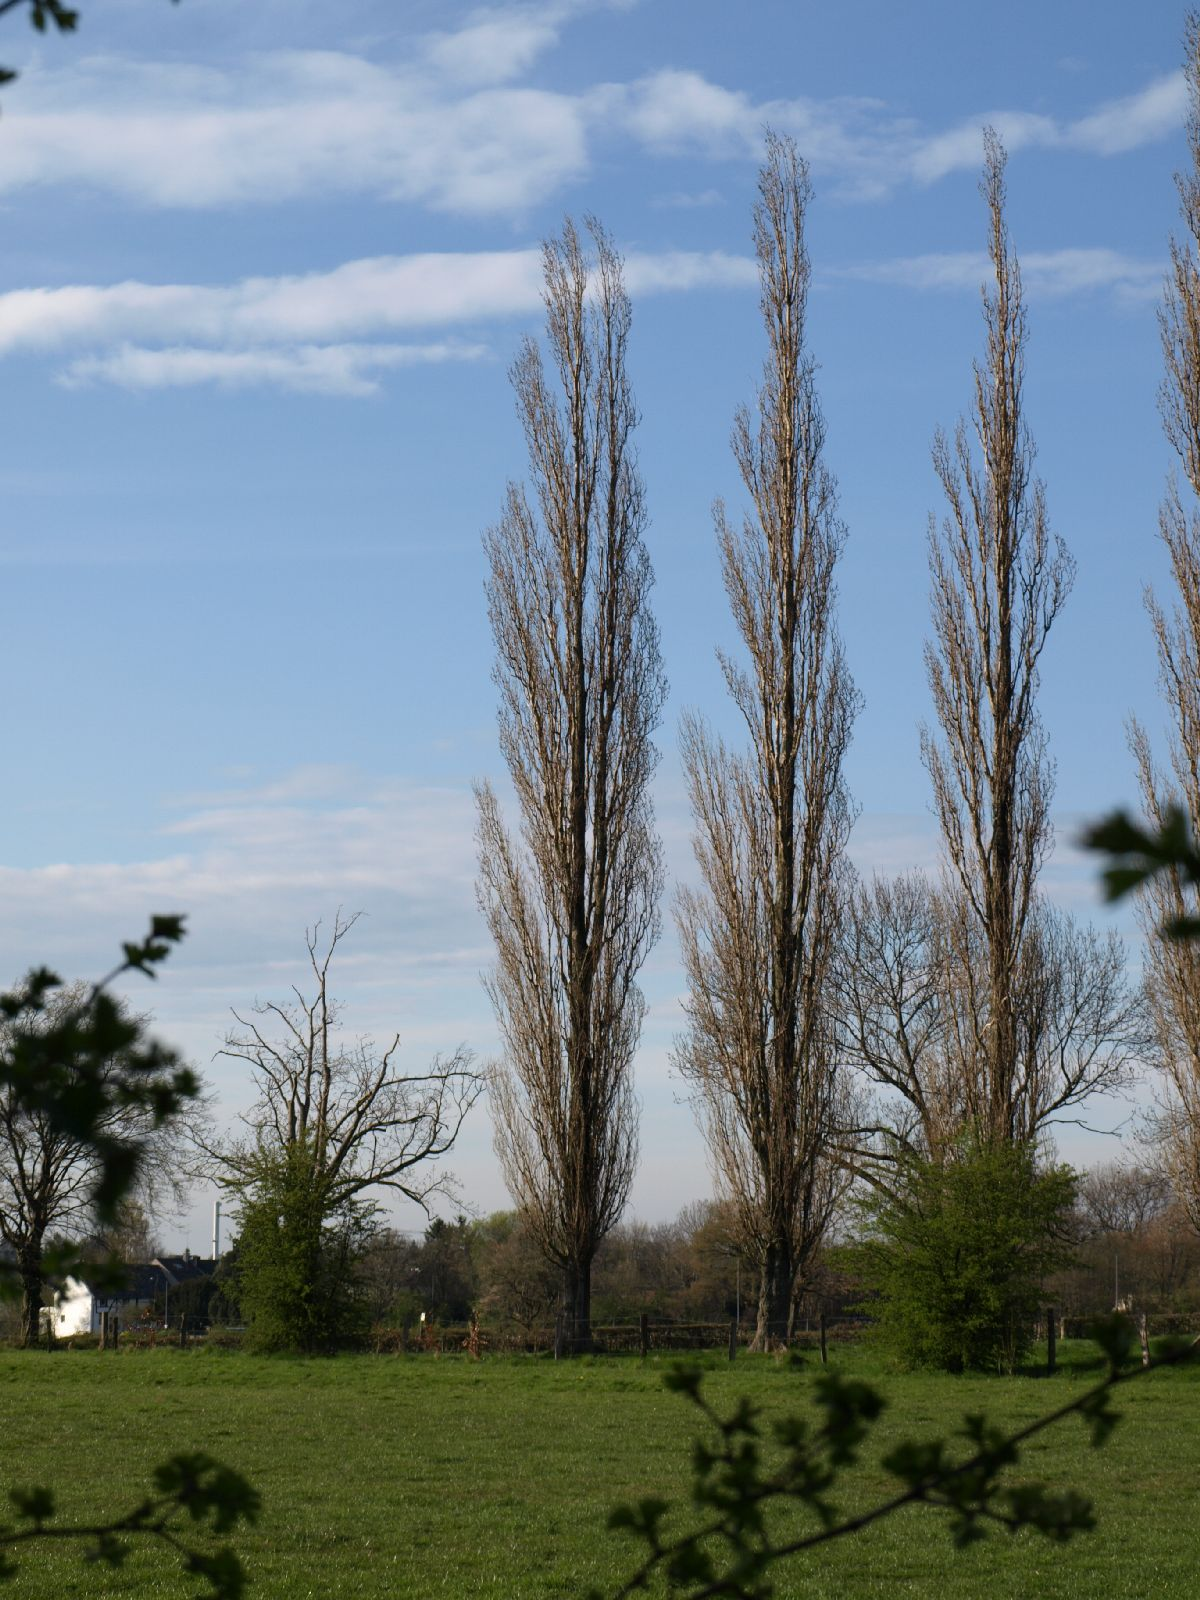 Pflanzen-Baum-Silhouette-Foto_Textur_B_P4201574